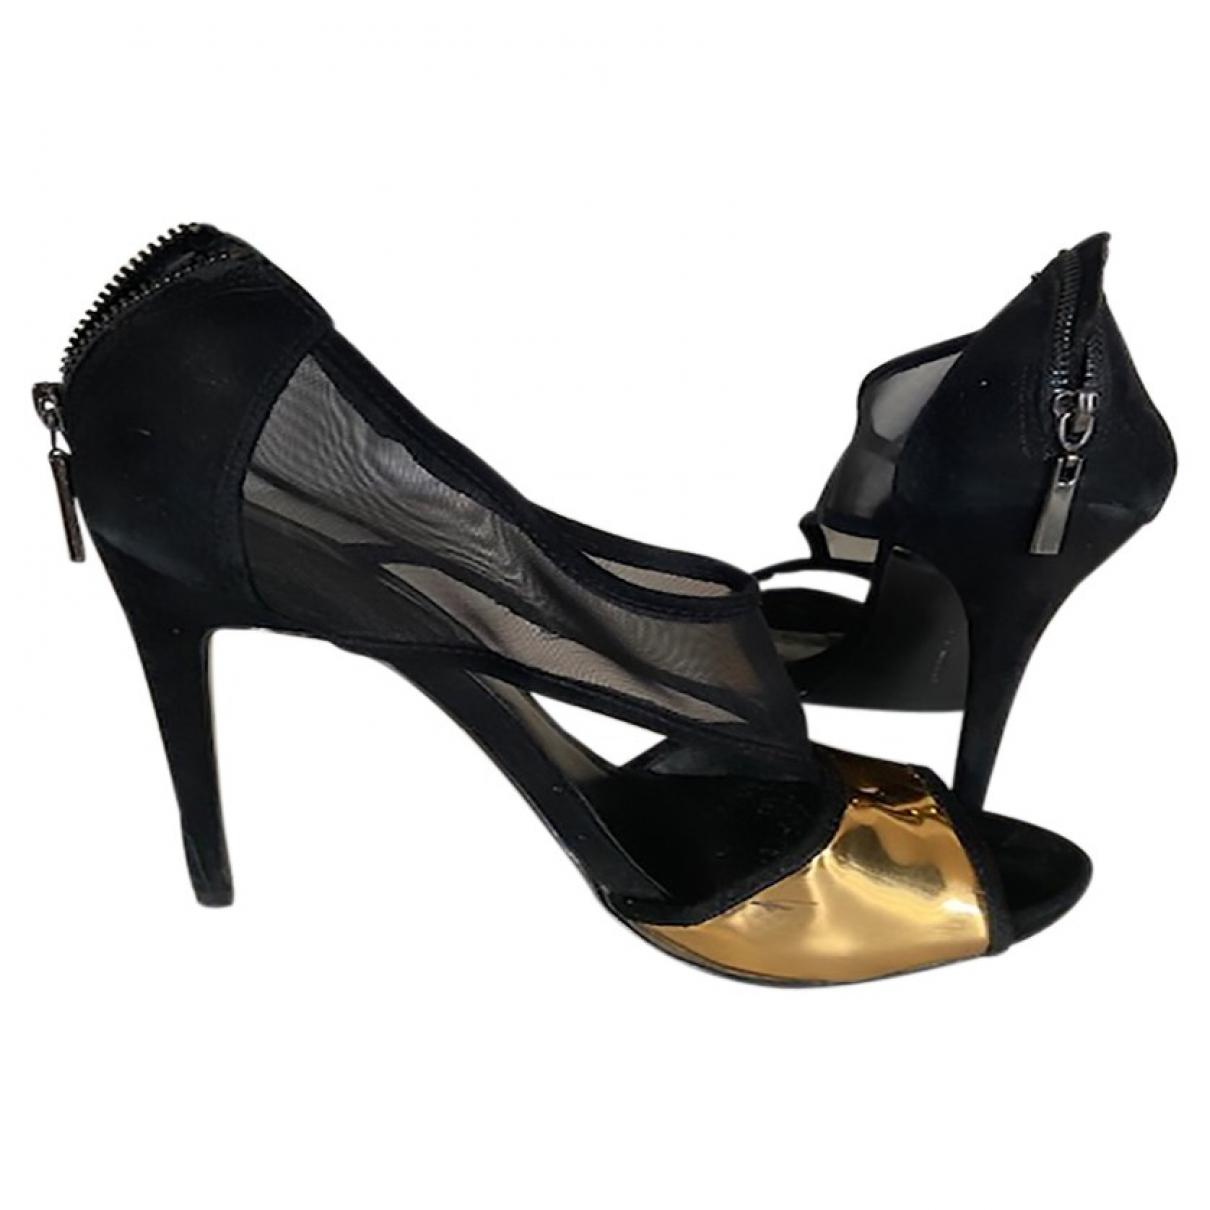 Zara \N Black Suede Heels for Women 38 EU